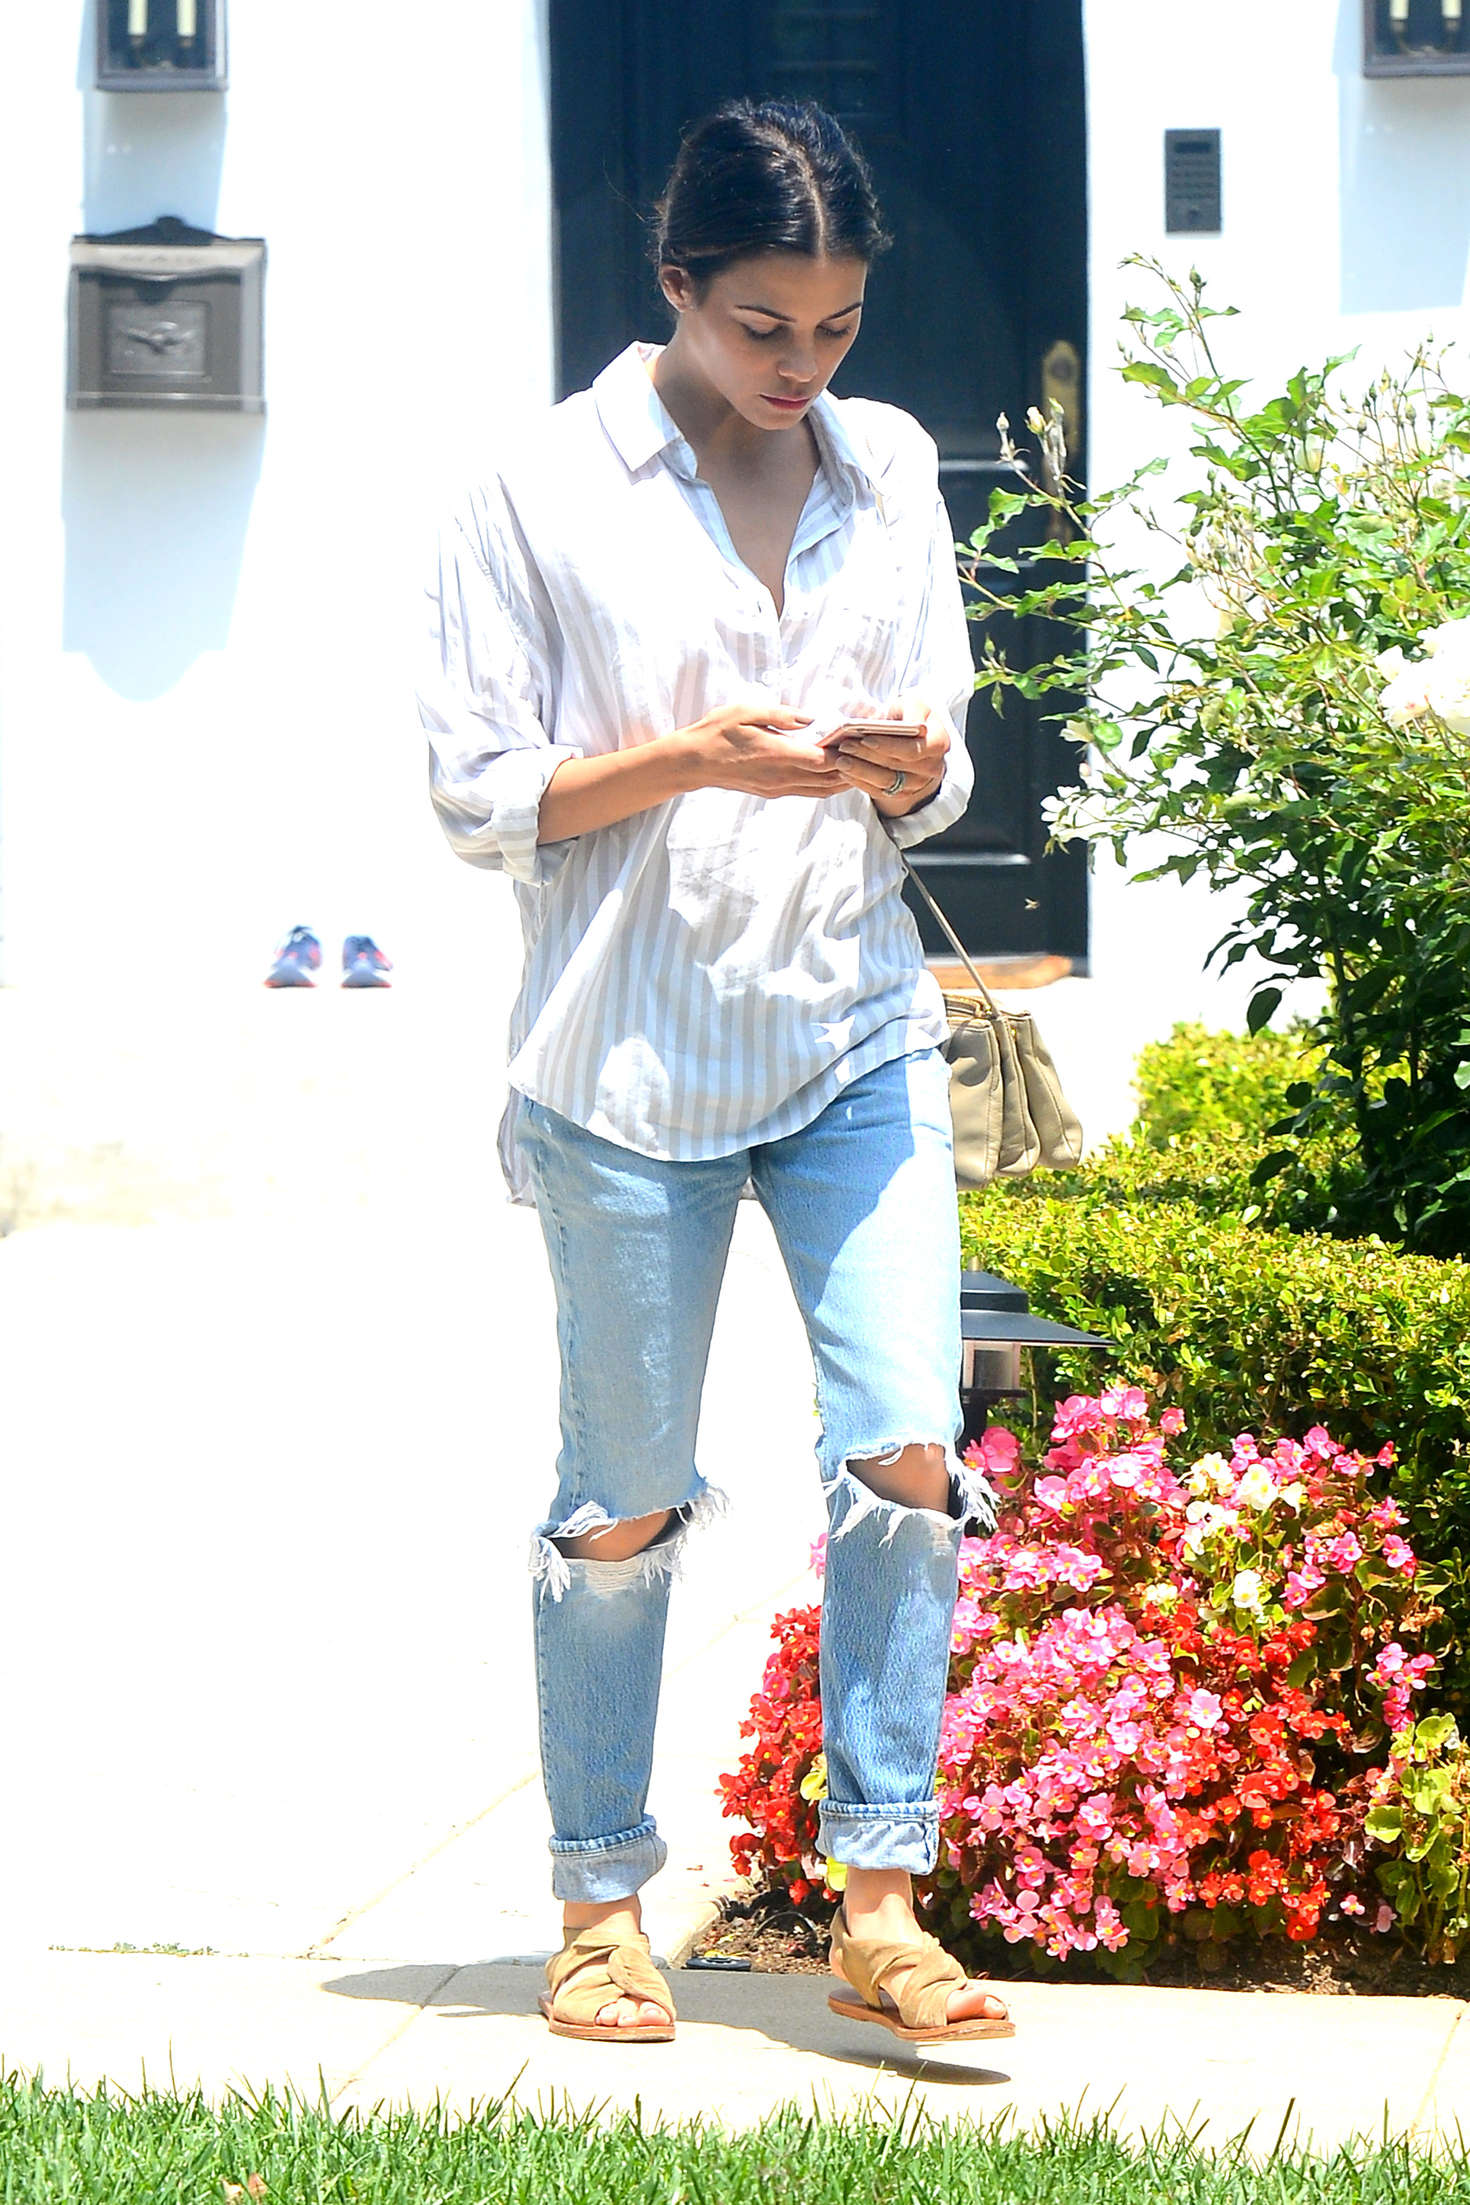 Jenna Dewan Tatum in Ripped Jeans Out in Beverly Hills